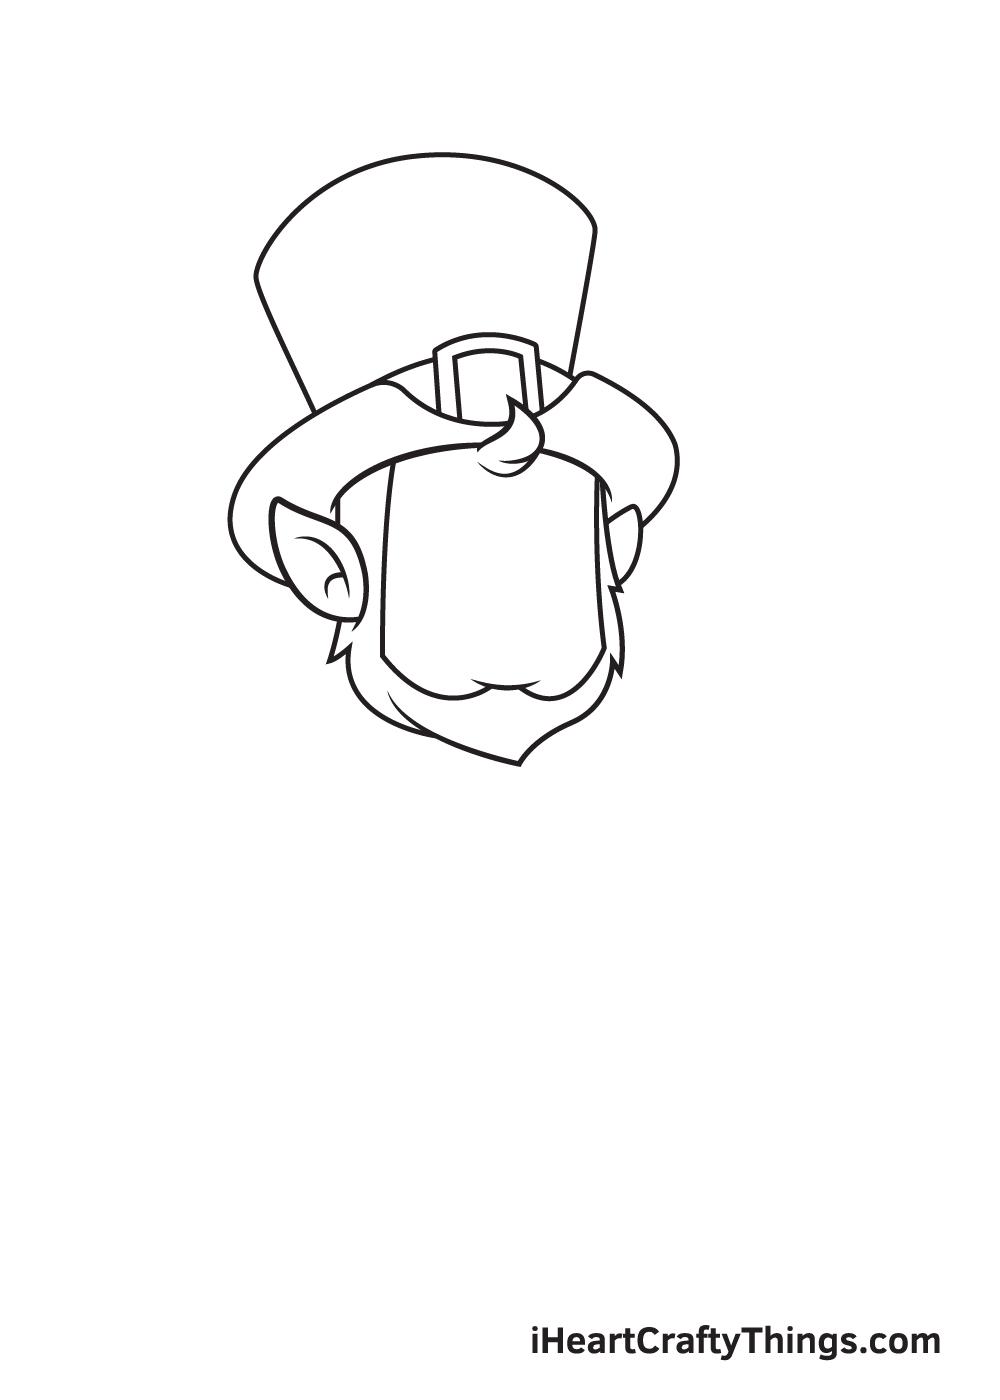 Leprechaun Drawing – Step 1